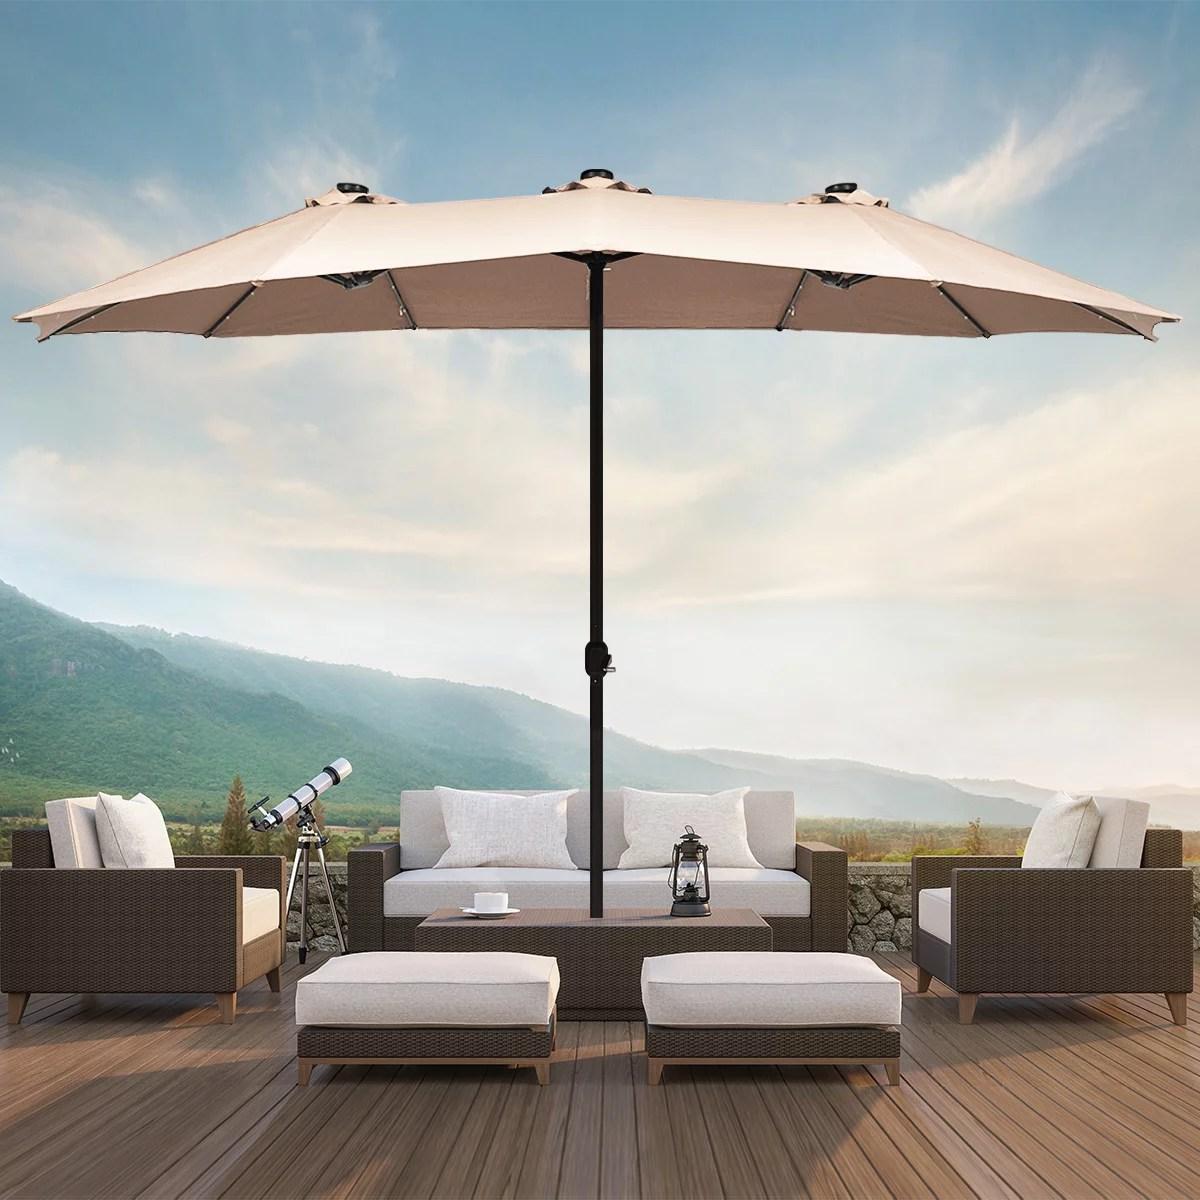 costway 15ft patio double sided solar led market umbrella crank beigetanorangeburgundy walmart com